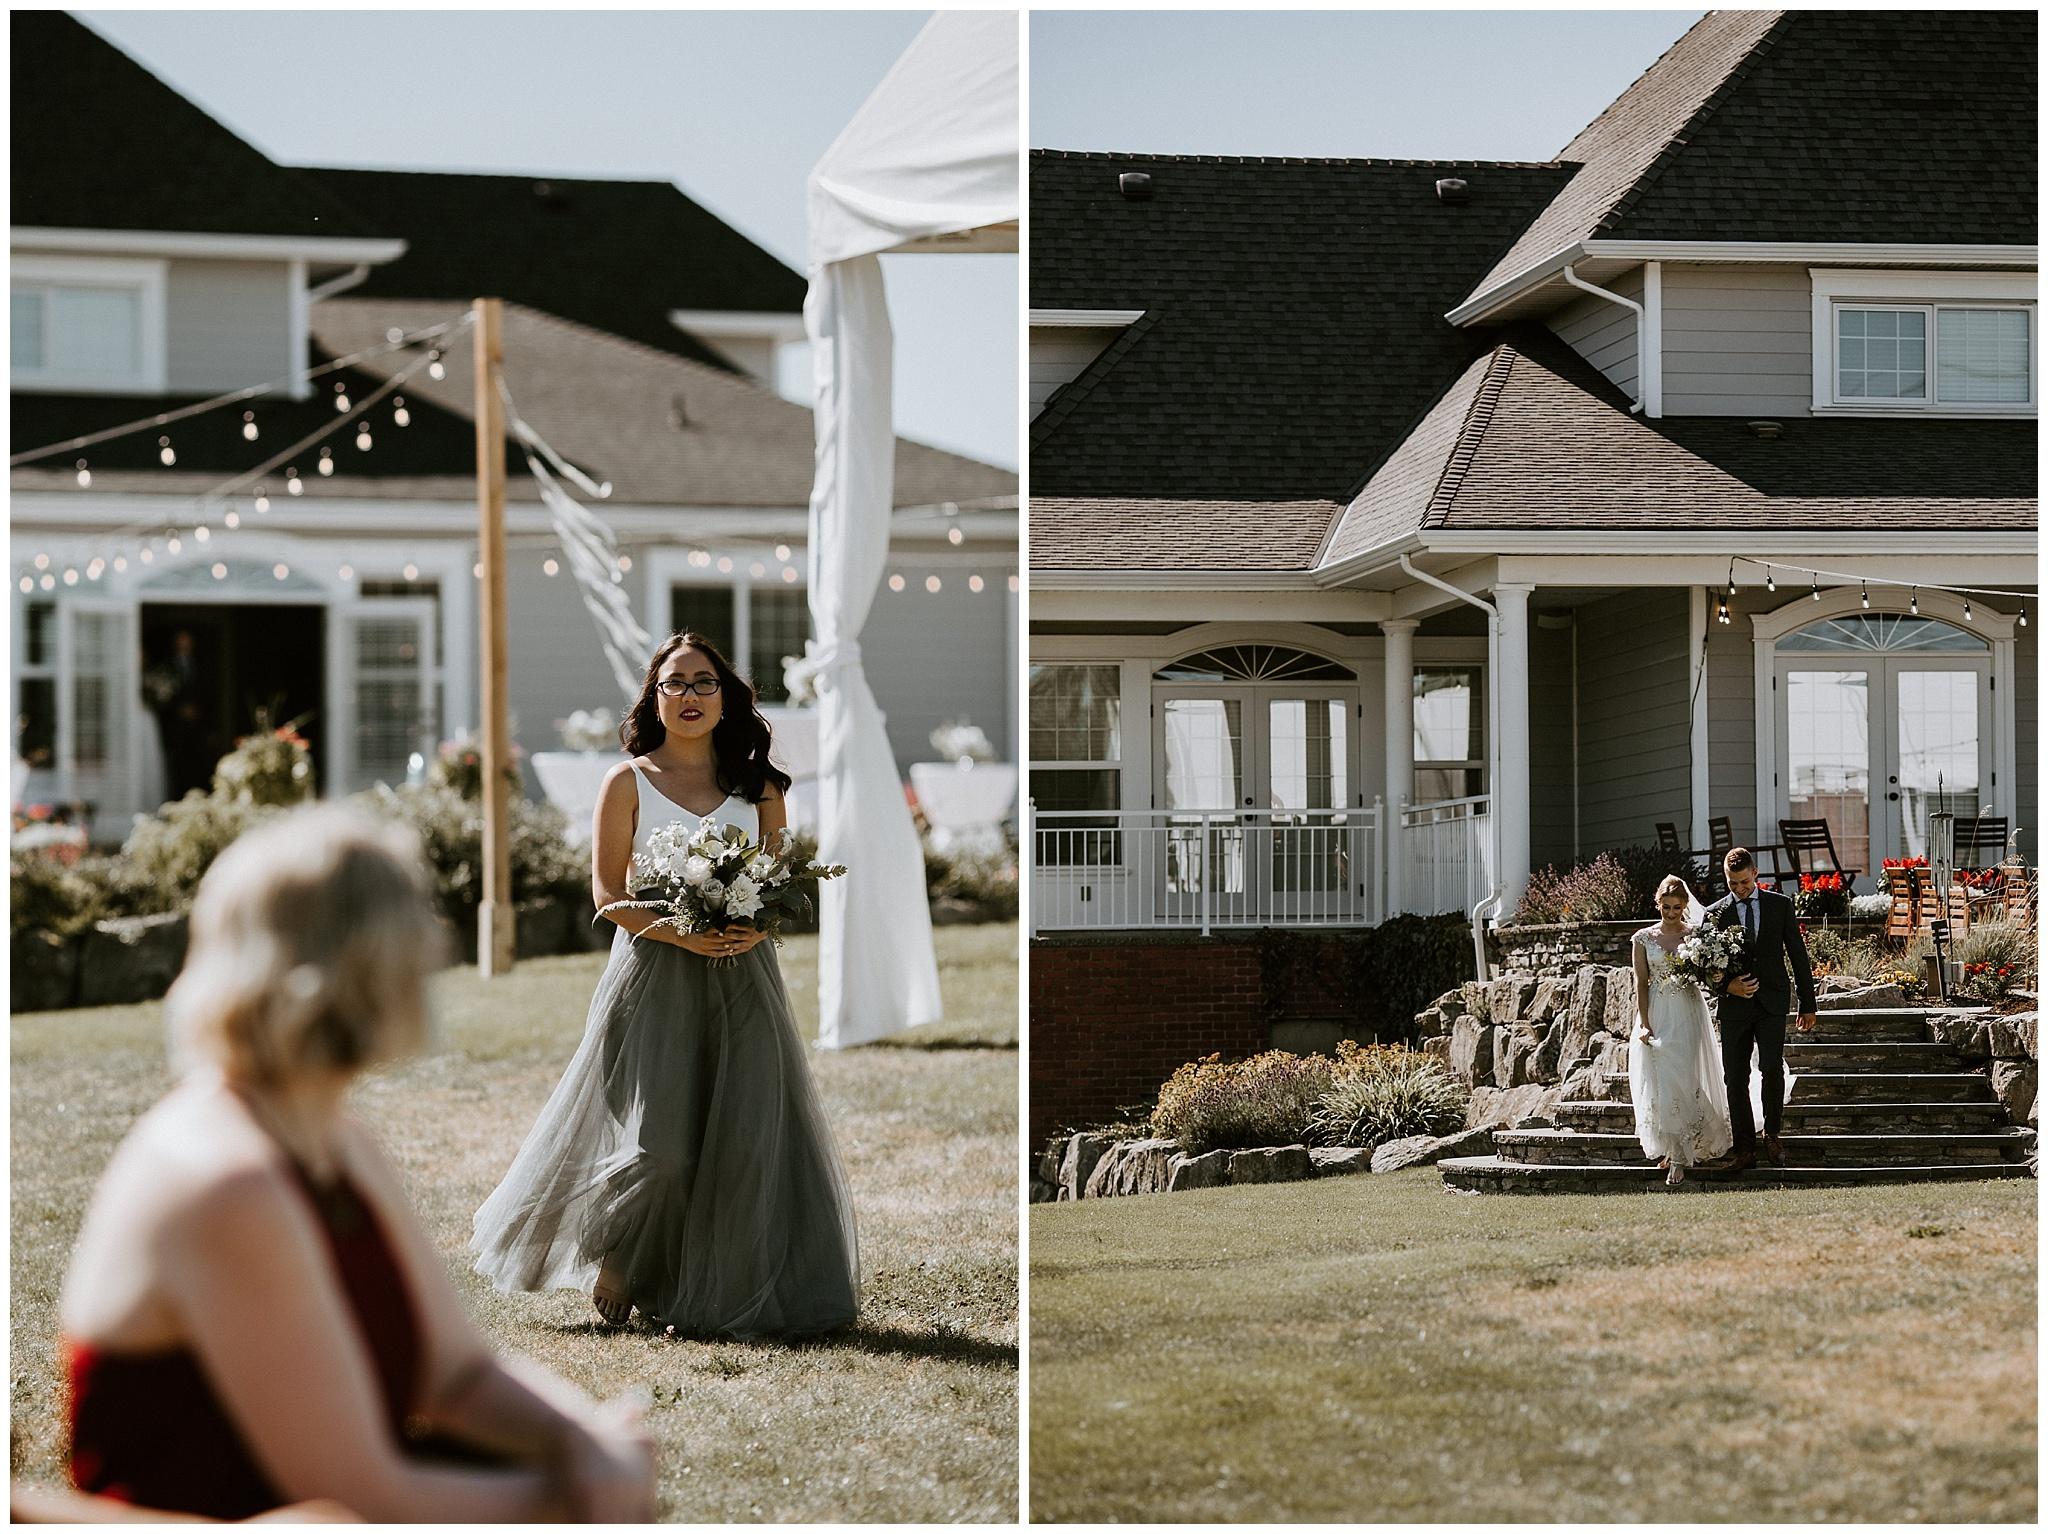 fort-langley-backyard-wedding-12.JPG